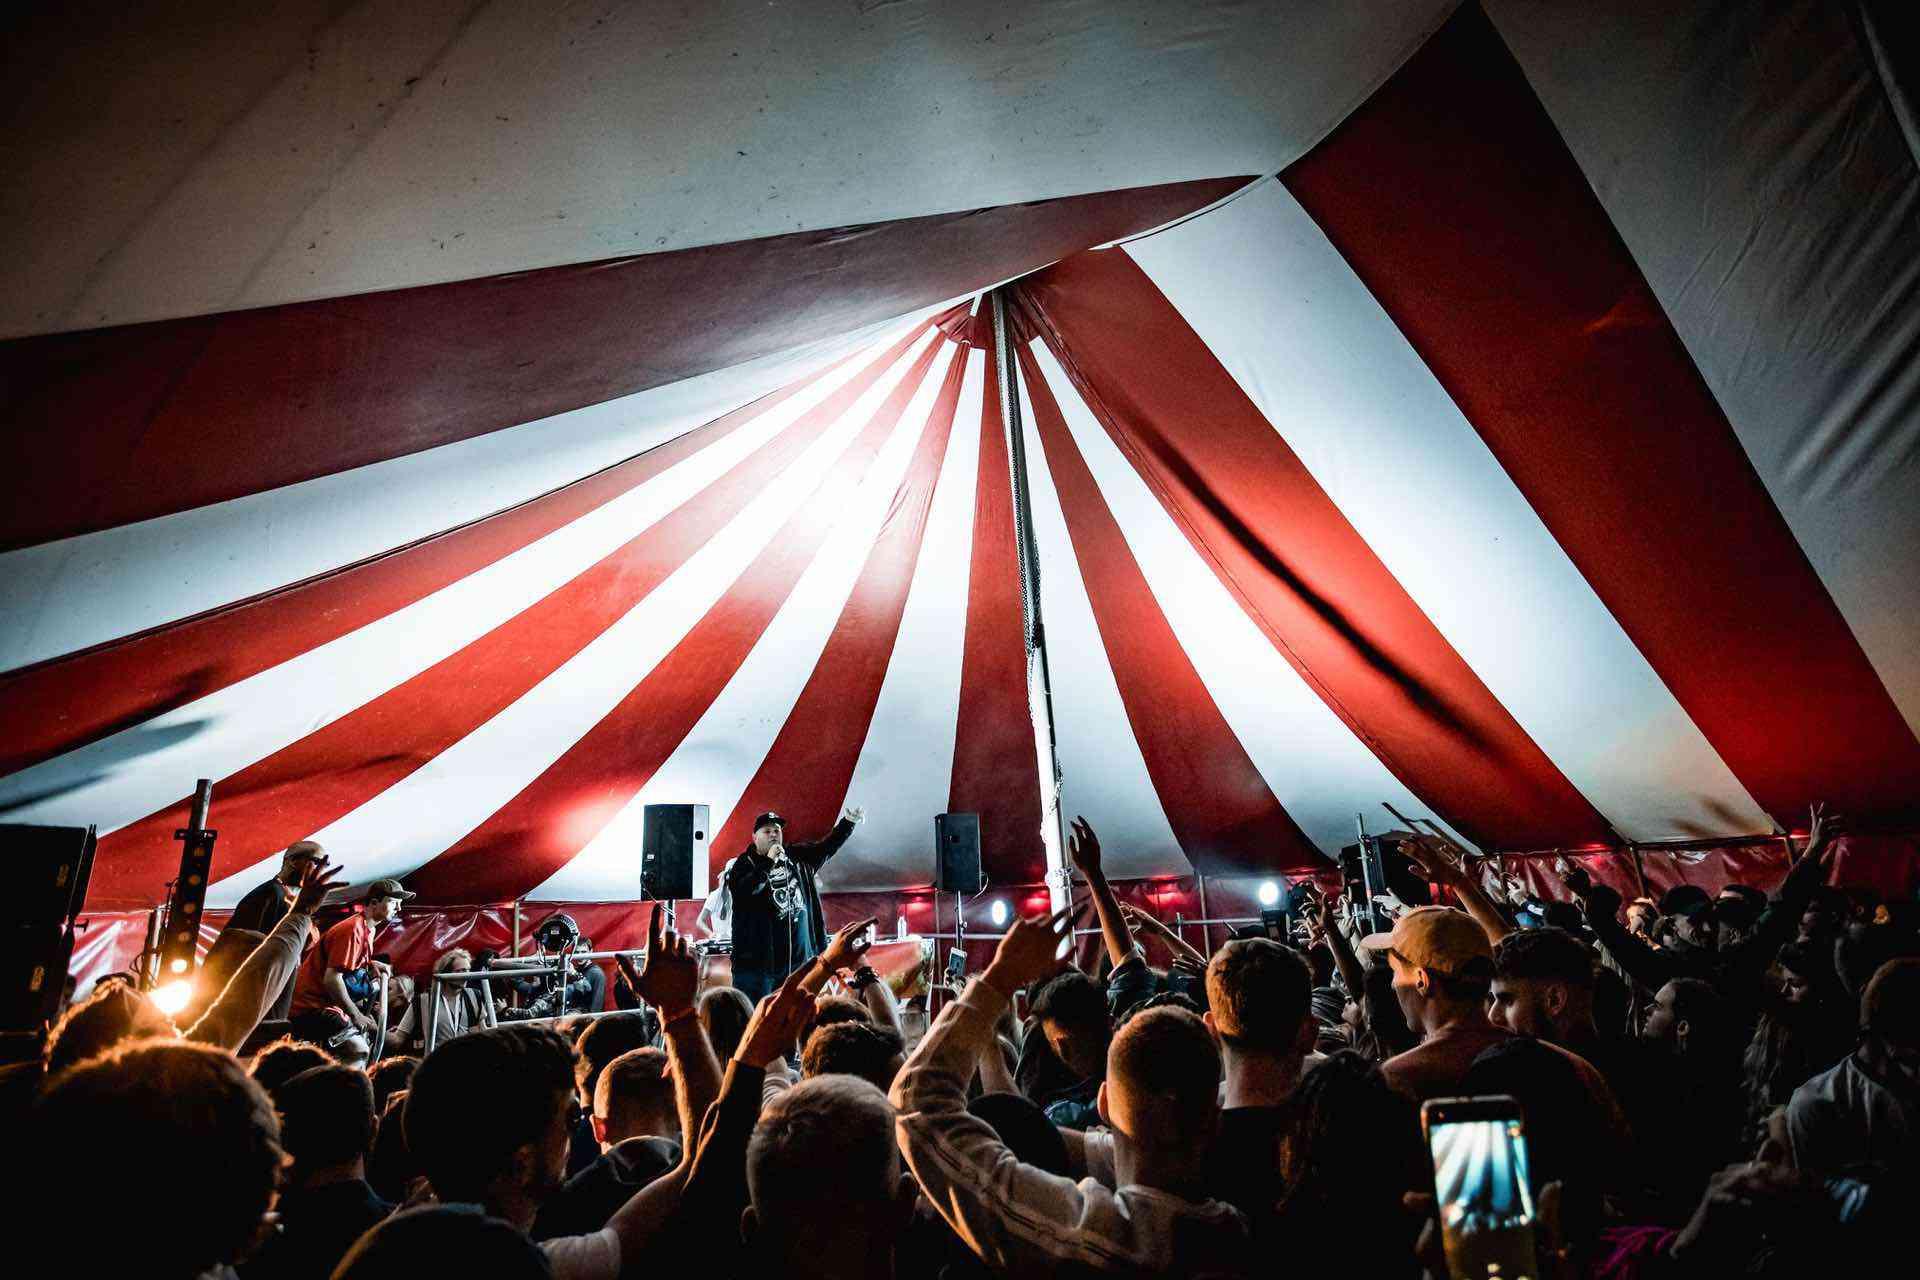 DJ Dance tent venue at cool beach festival in north devon uk